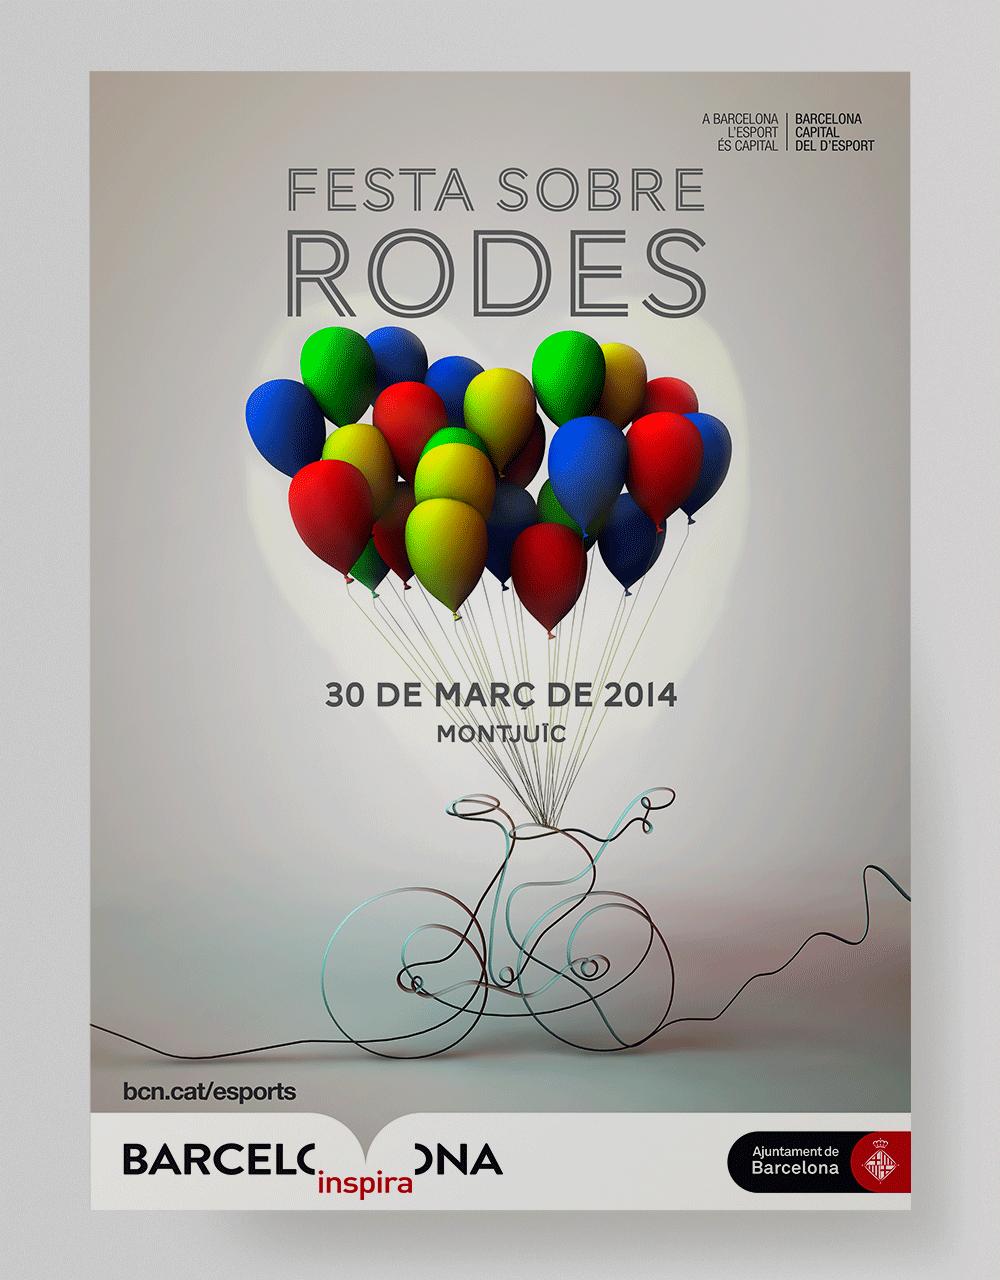 Posters_FestaSobreRodes_BCN_Esports